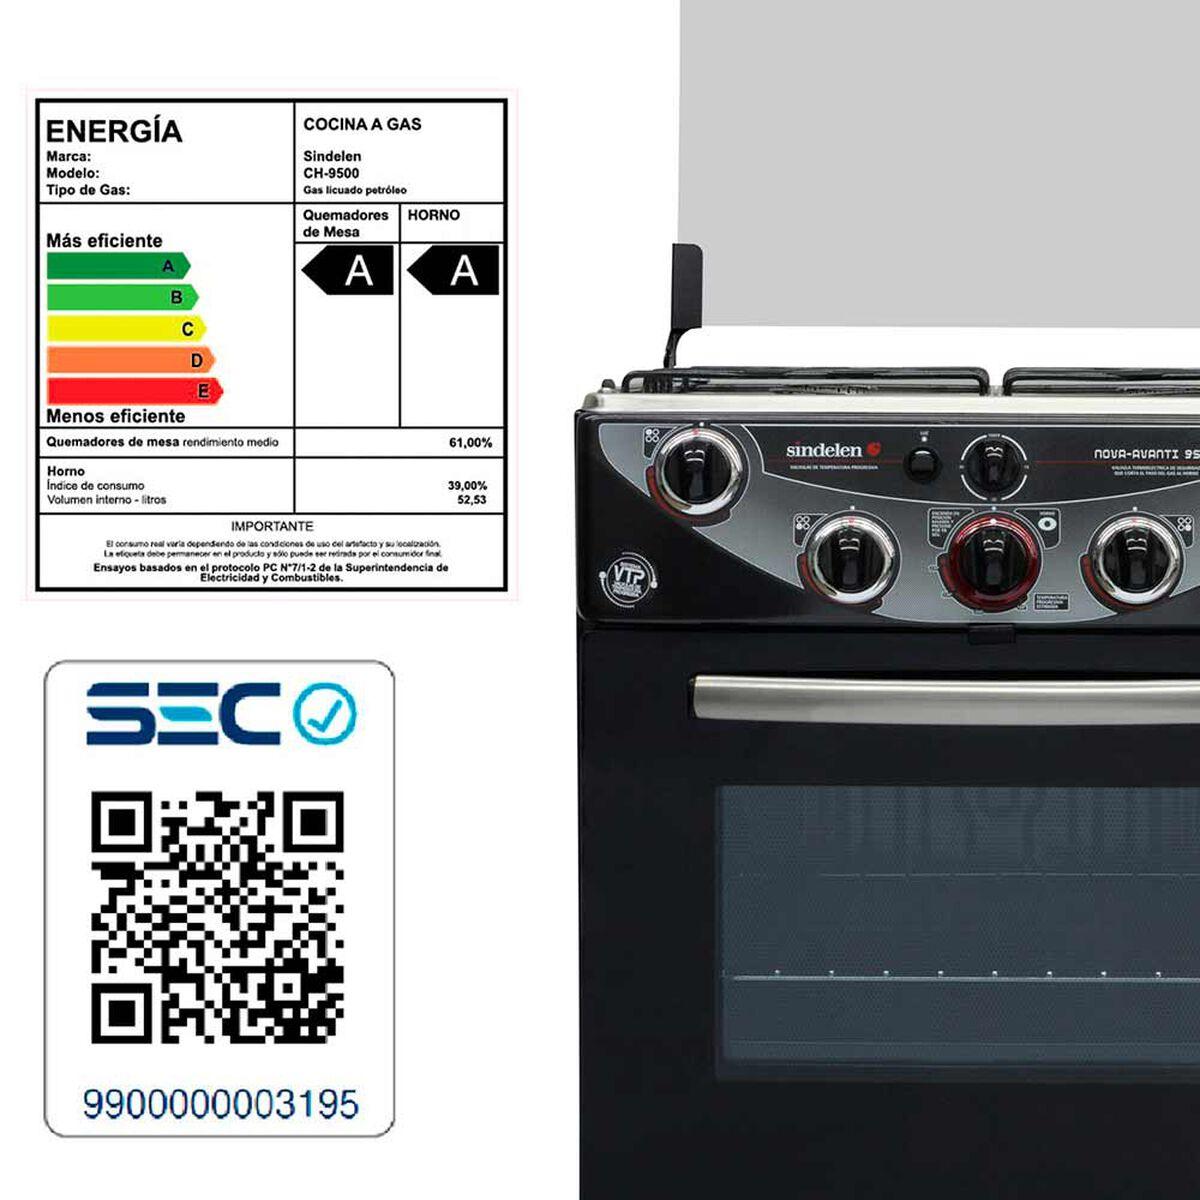 Cocina a Gas Sindelen CH 9500 68 lt